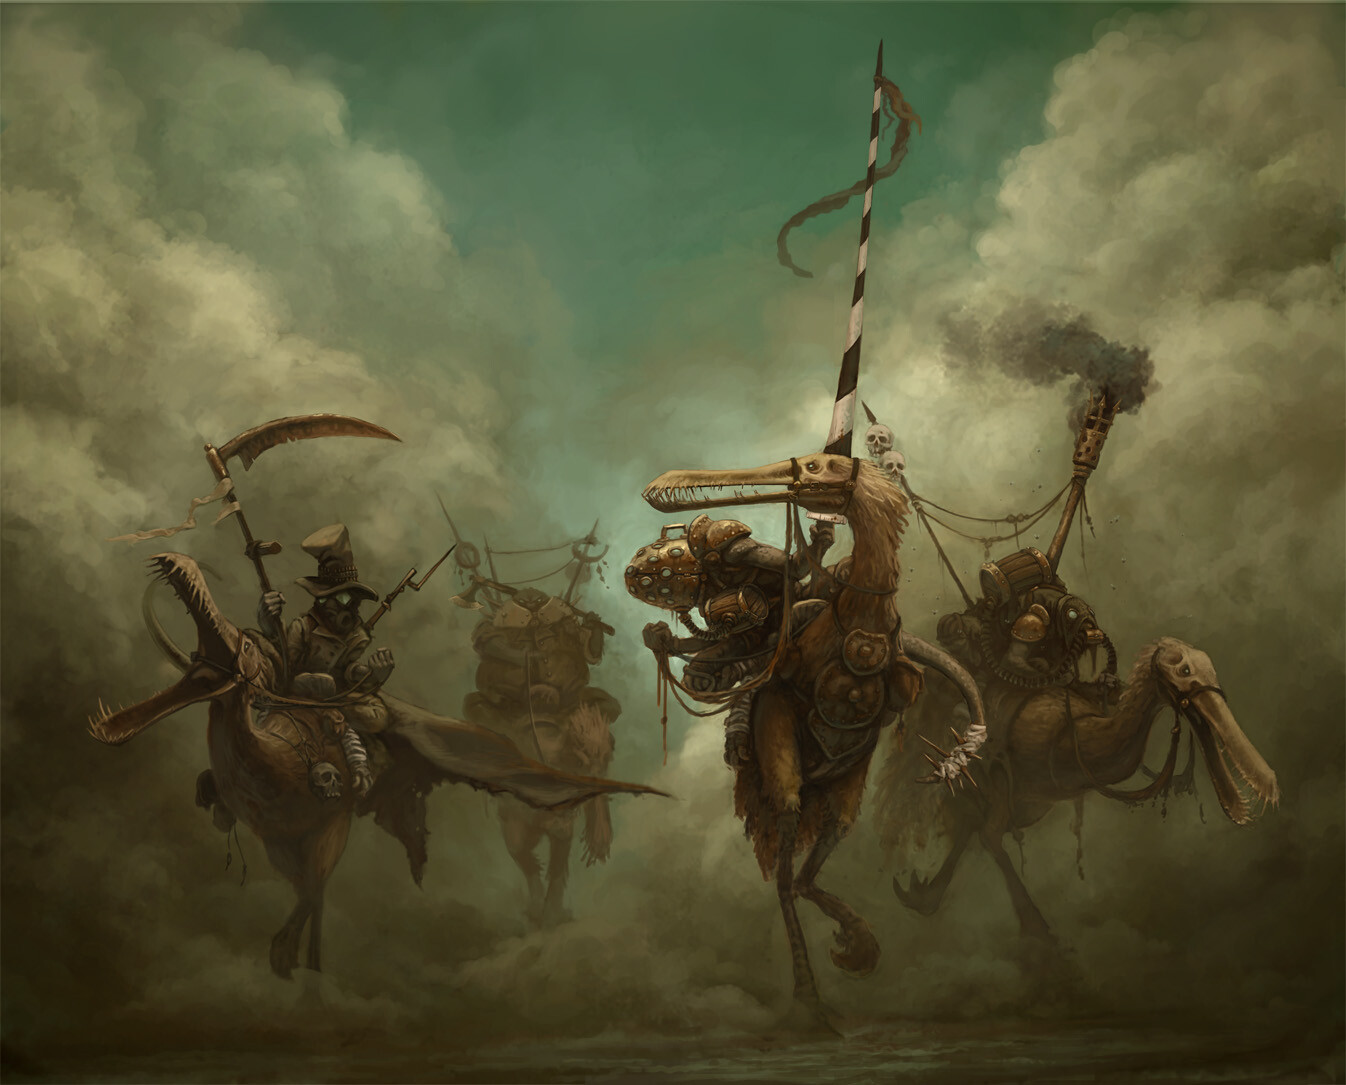 ArtStation - The Four Horsemen, Gordon Oscar